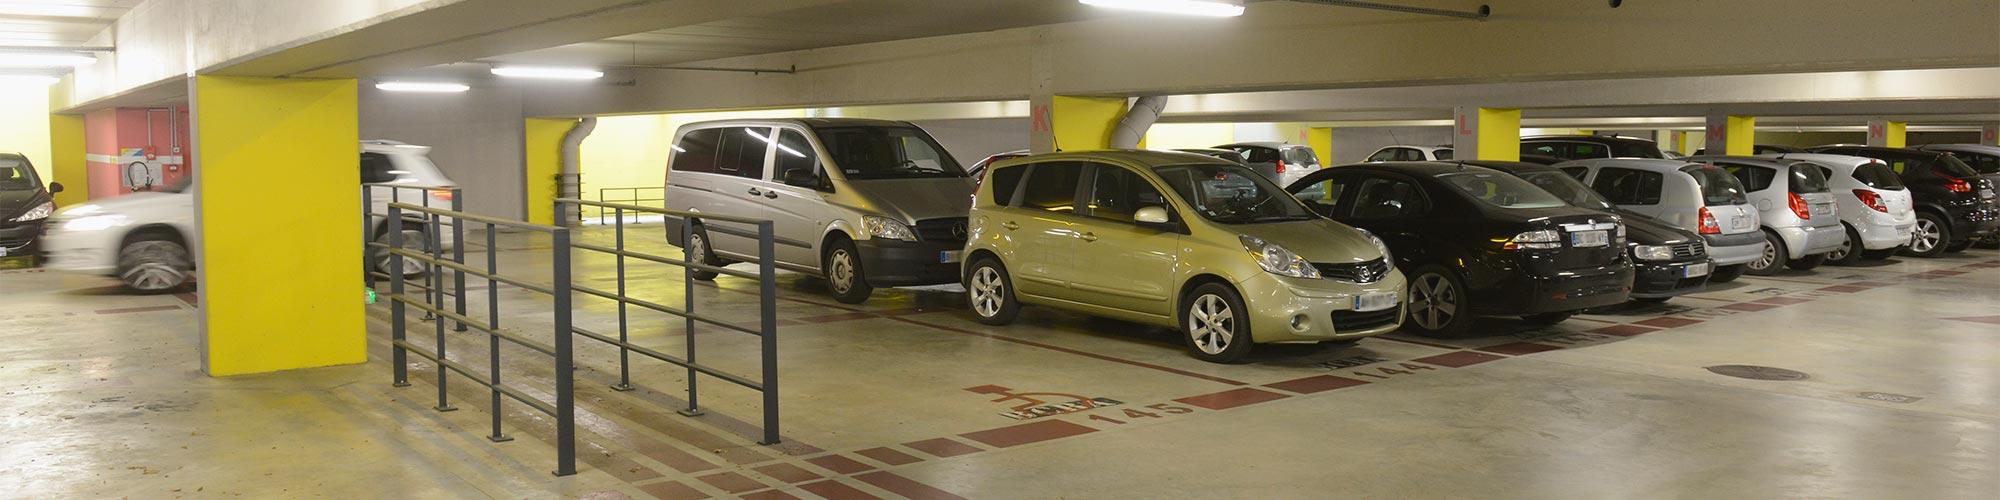 parking-saint-serge-angers